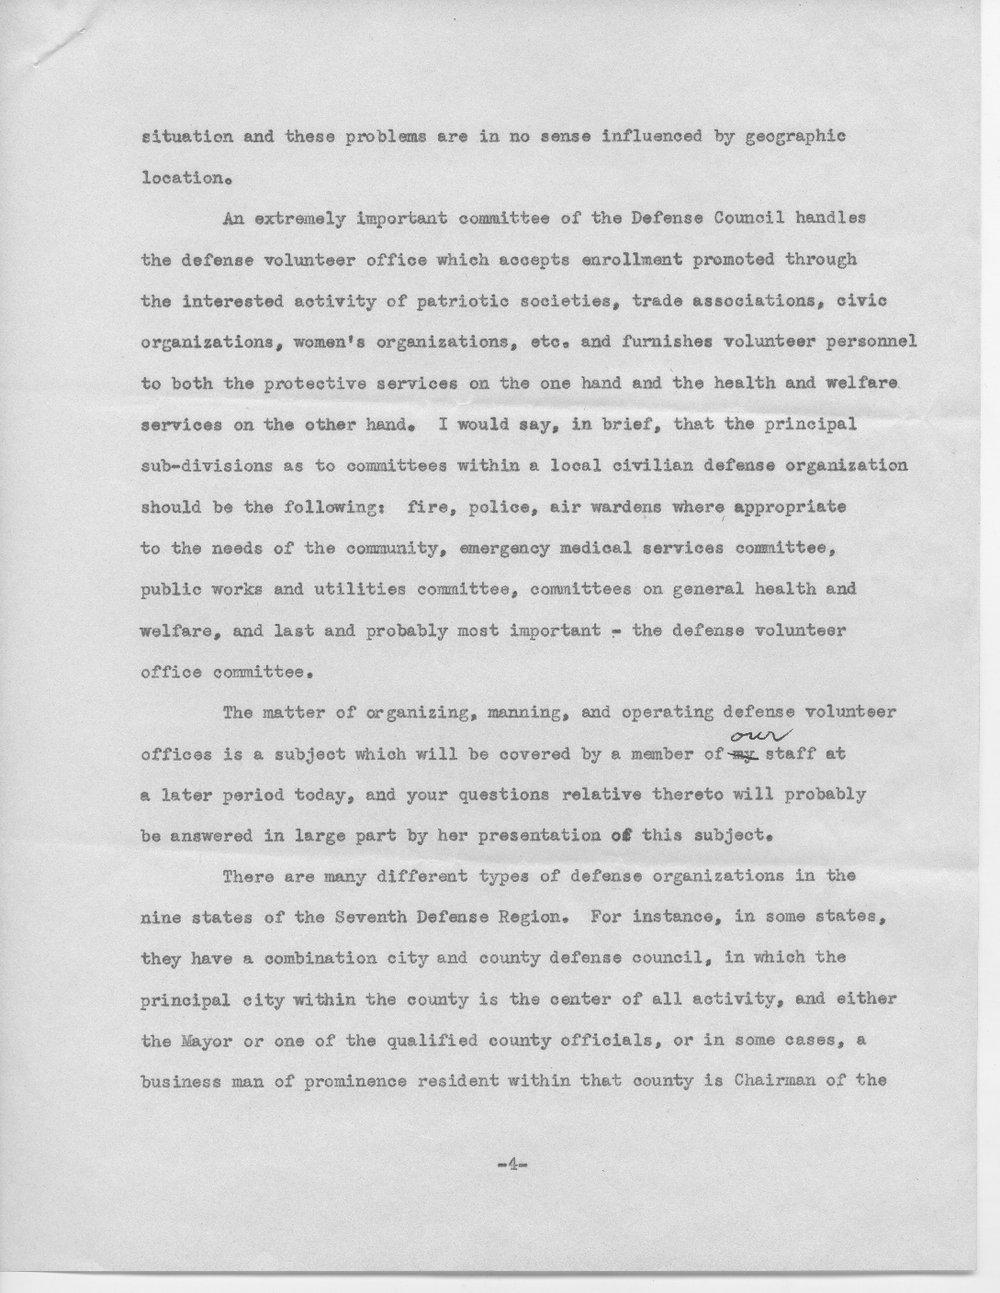 Address by Col. E.L. Wilbur - 4